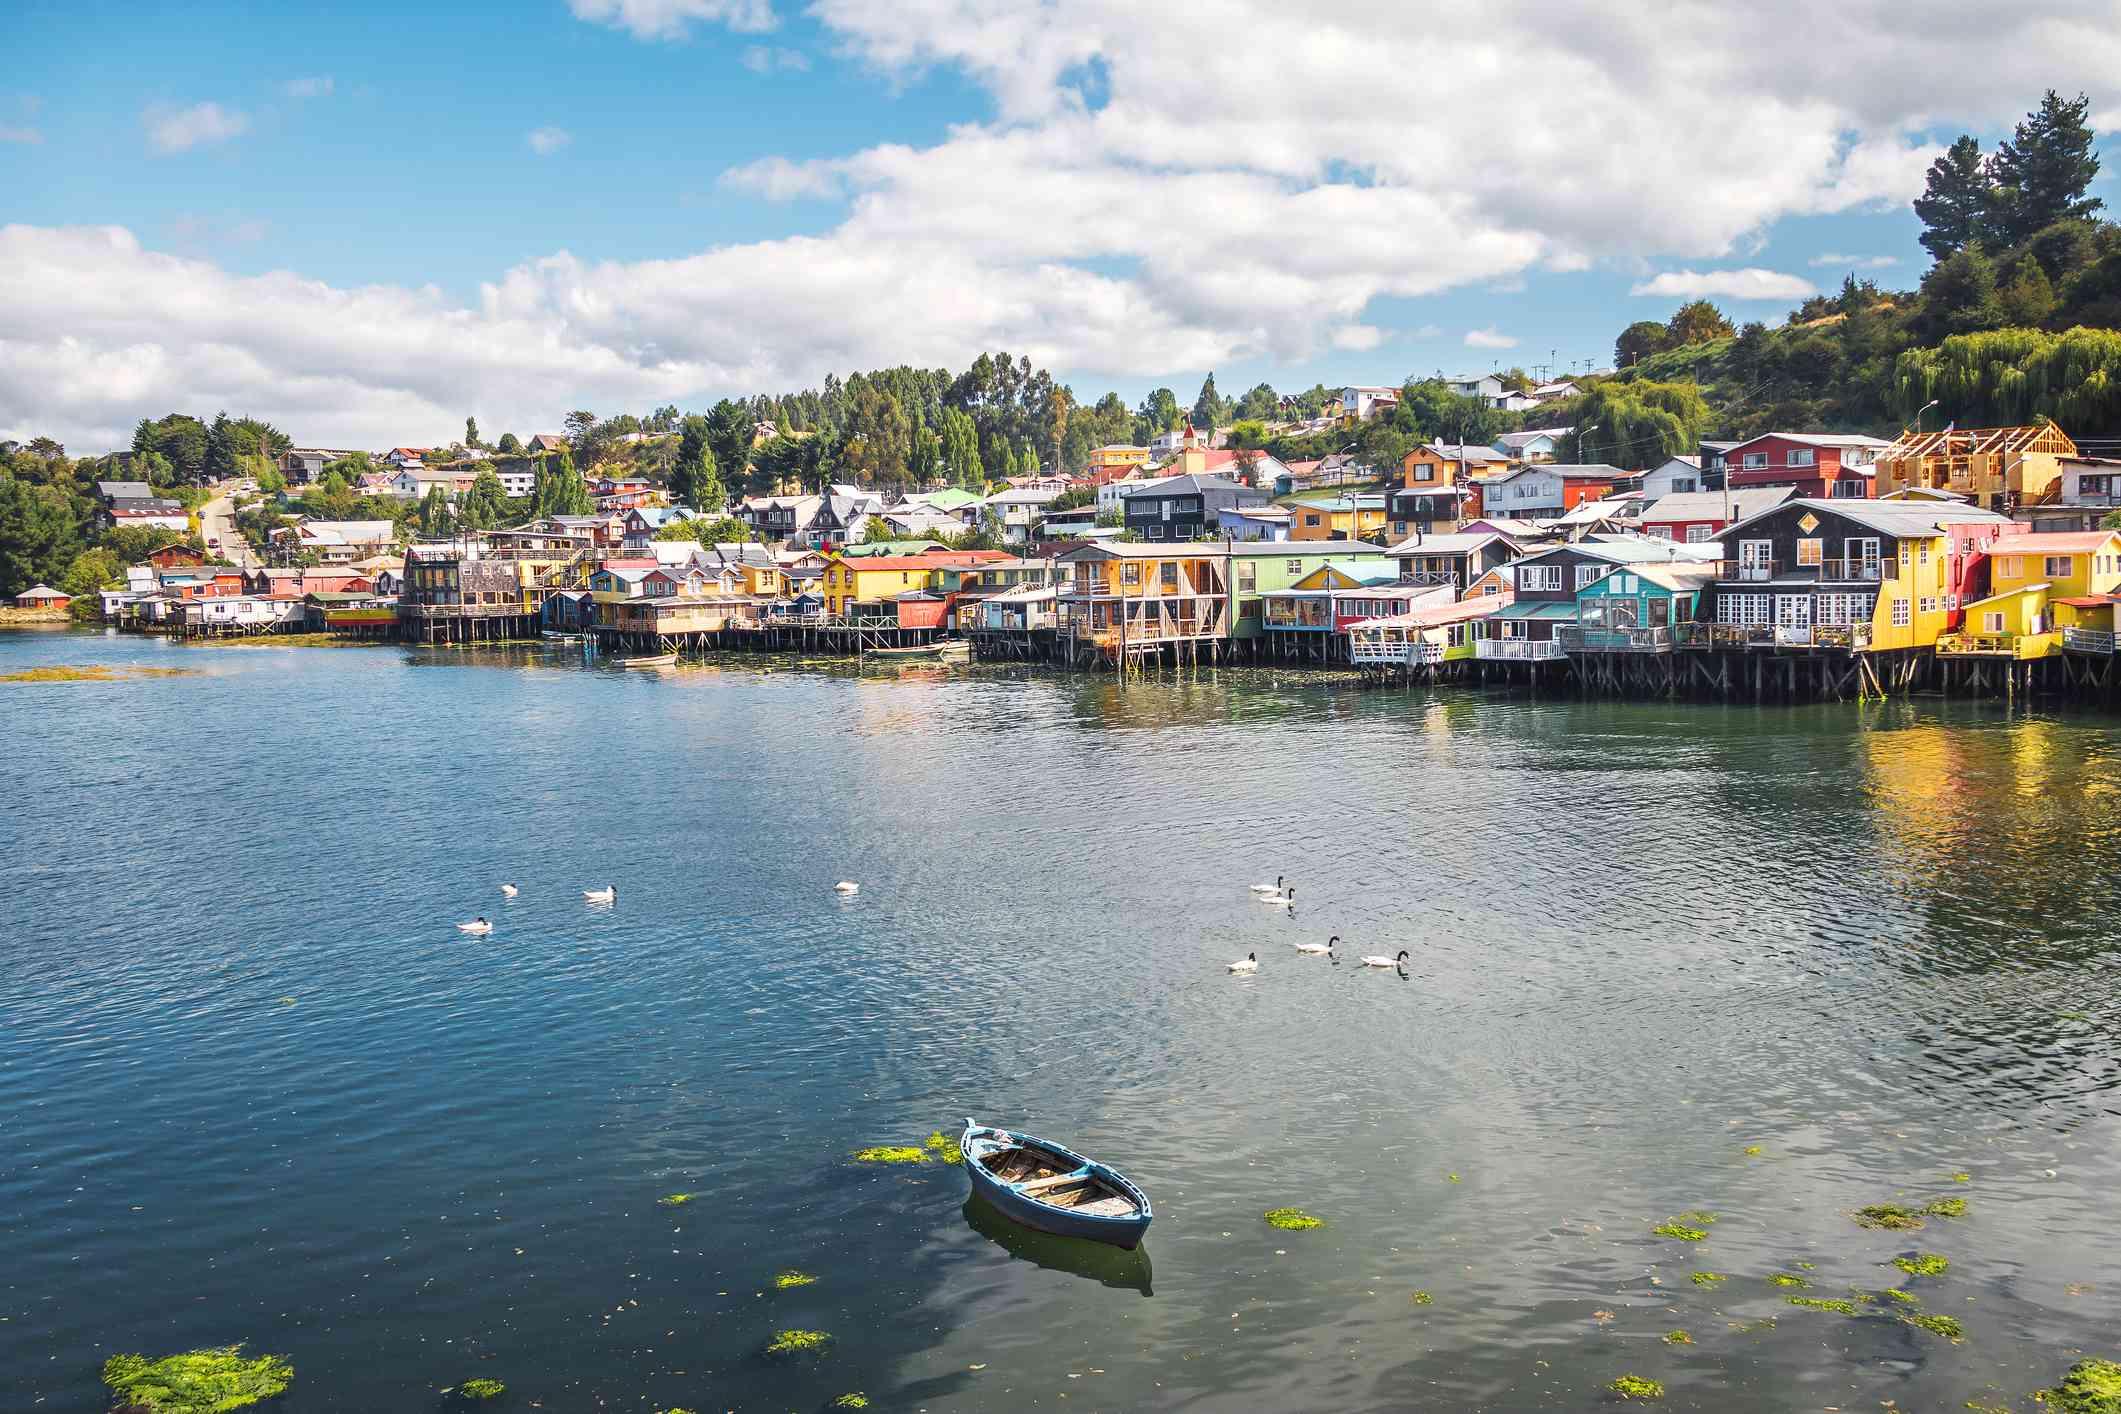 Gamboa Palafitos Stilt Houses - Castro, Chiloe Island, Chile